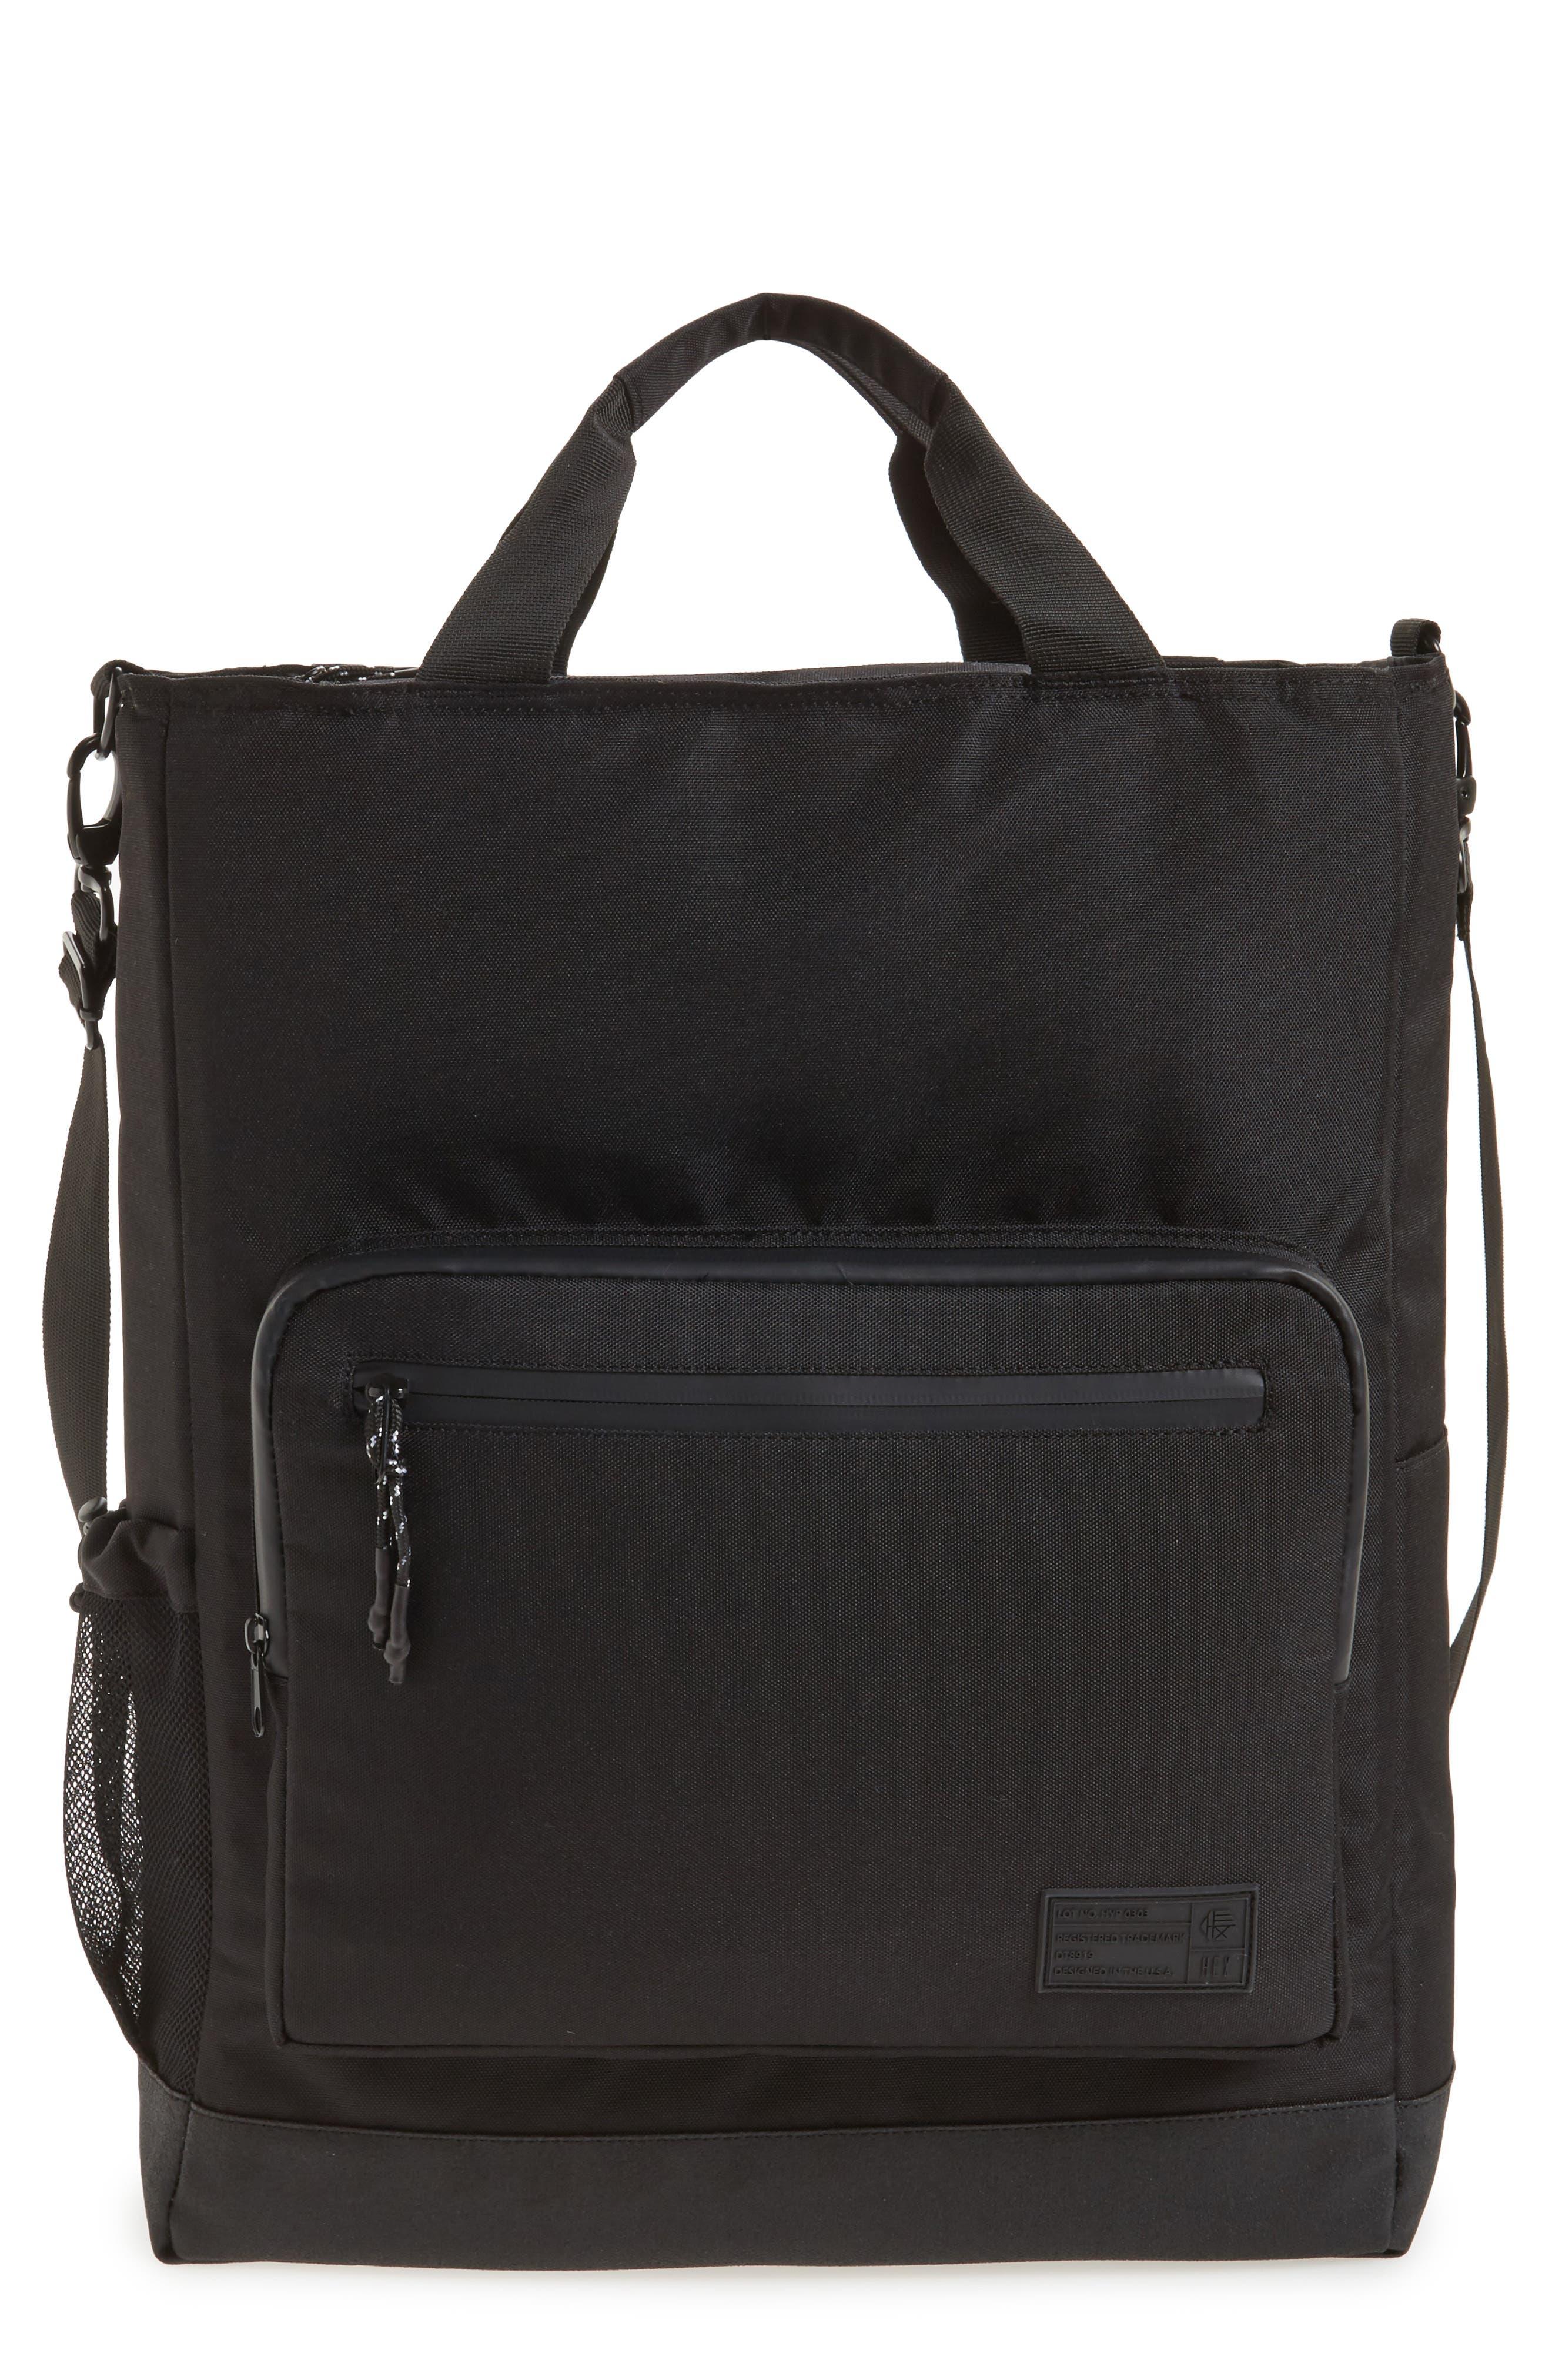 Alternate Image 1 Selected - HEX Surf Tote Bag